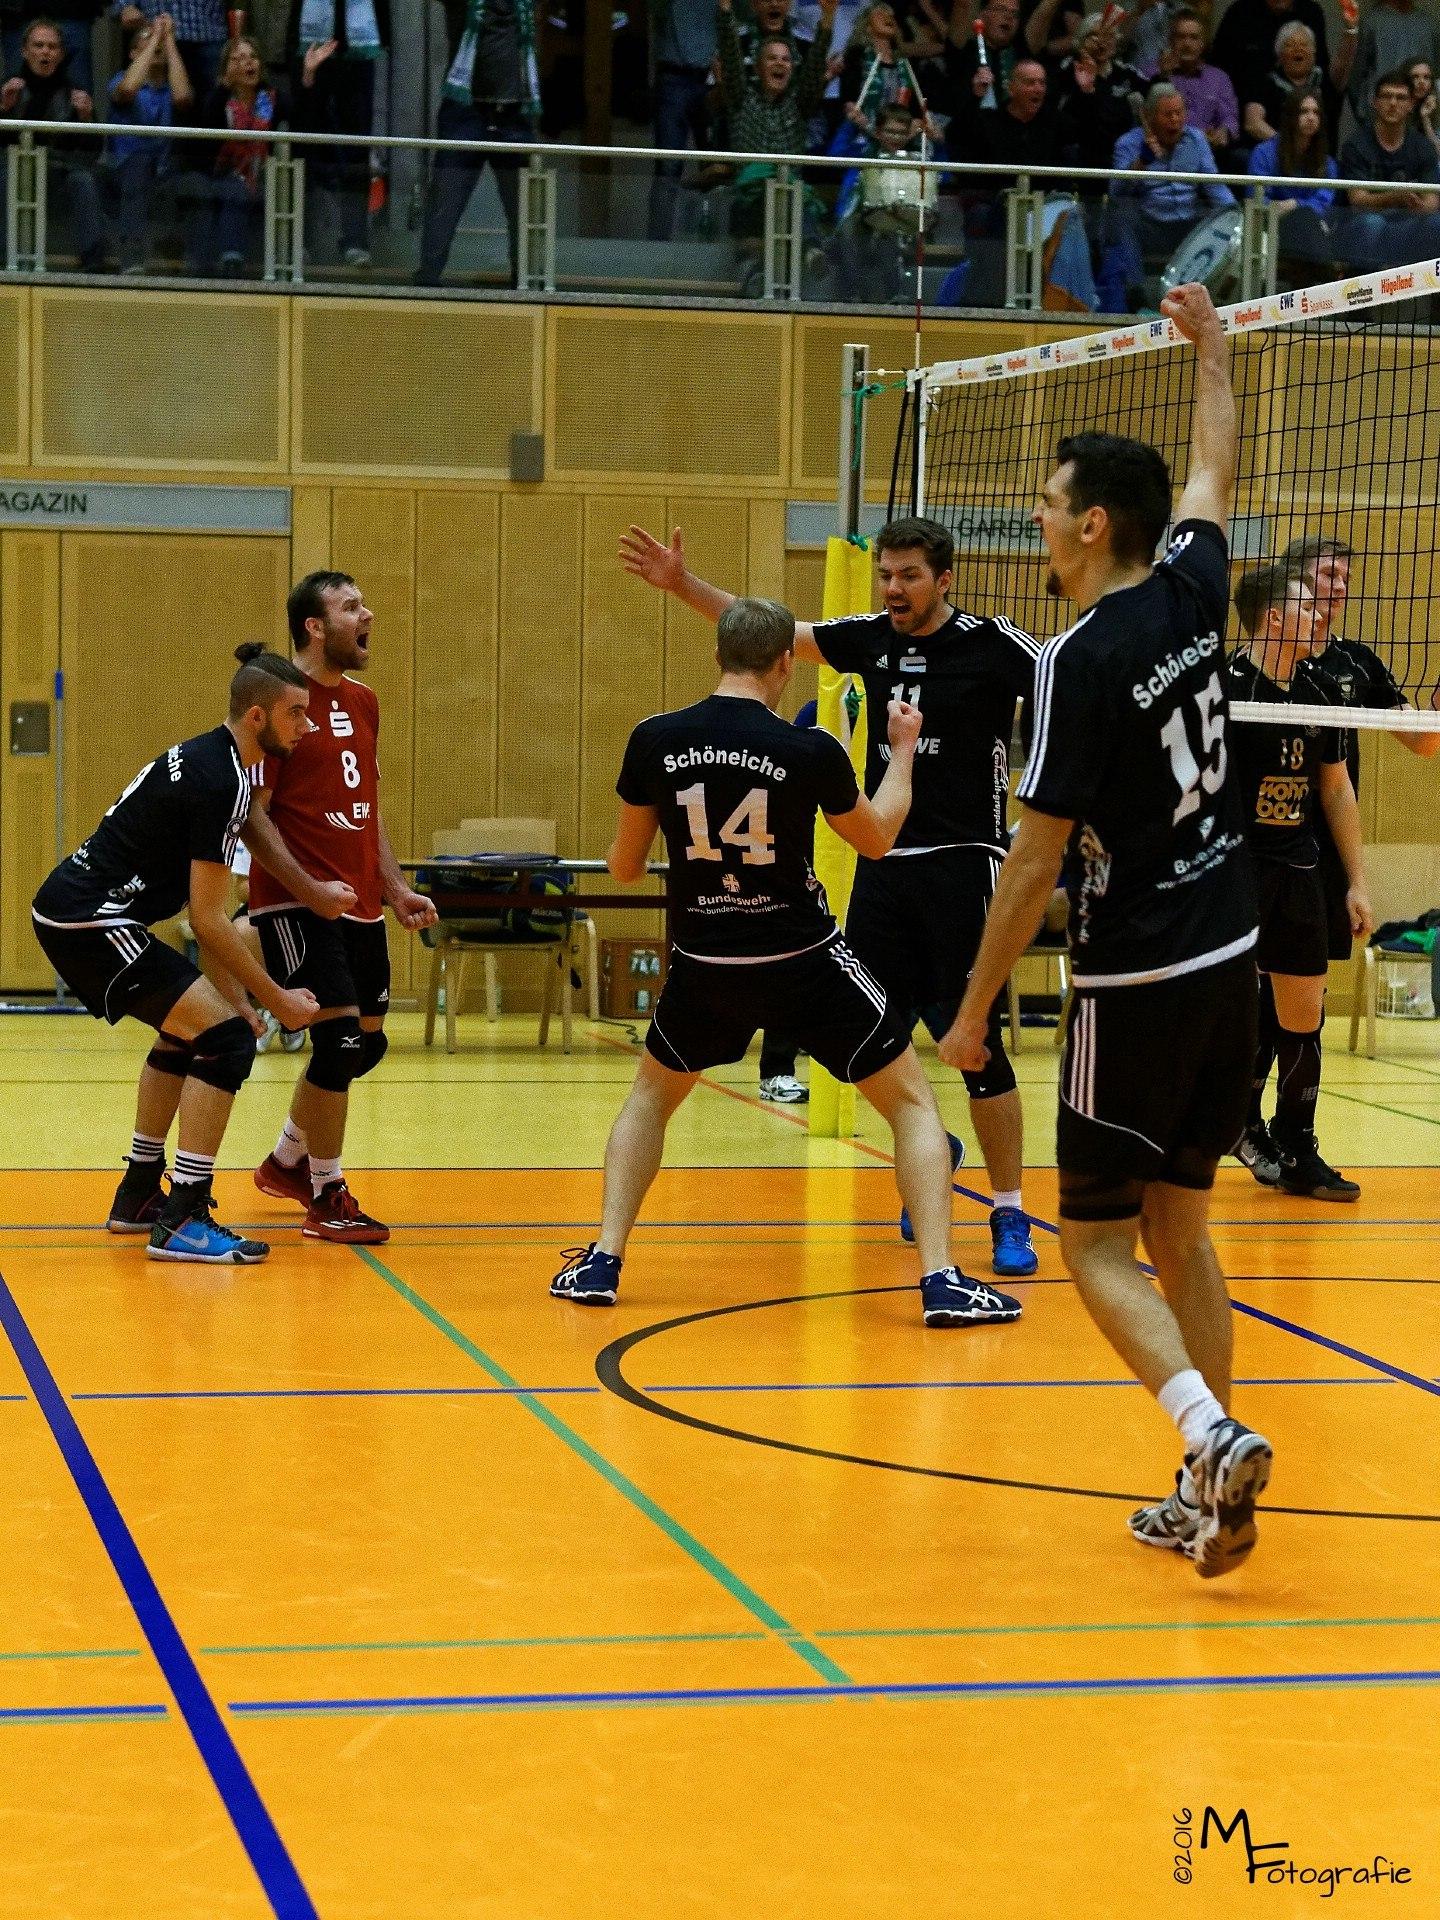 volleyball frauen 2. bundesliga